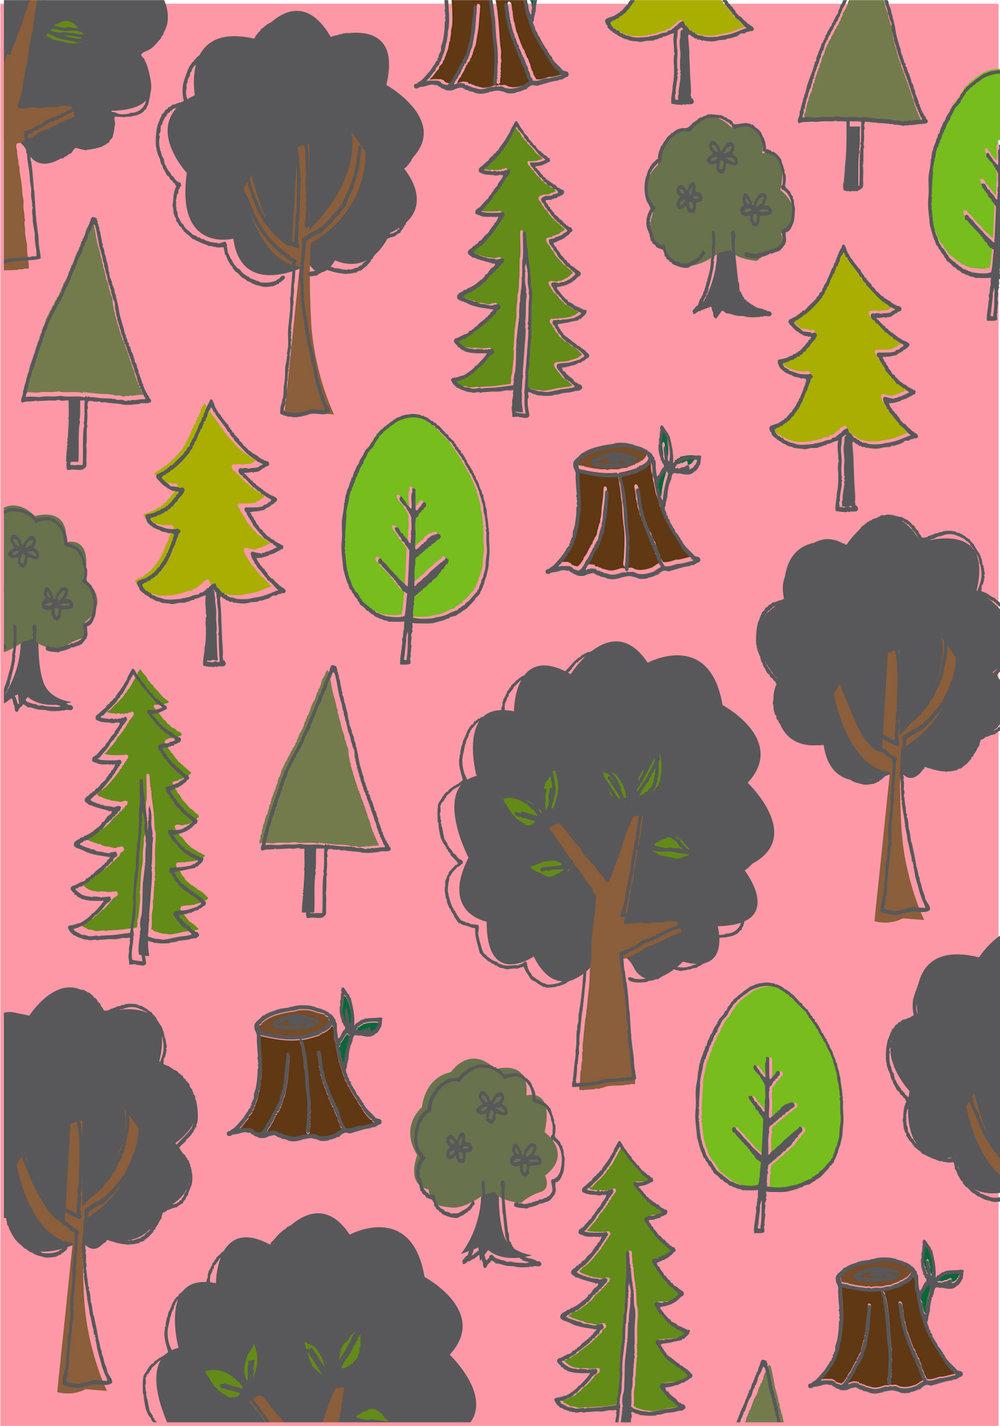 jami_darwin_trees.jpg